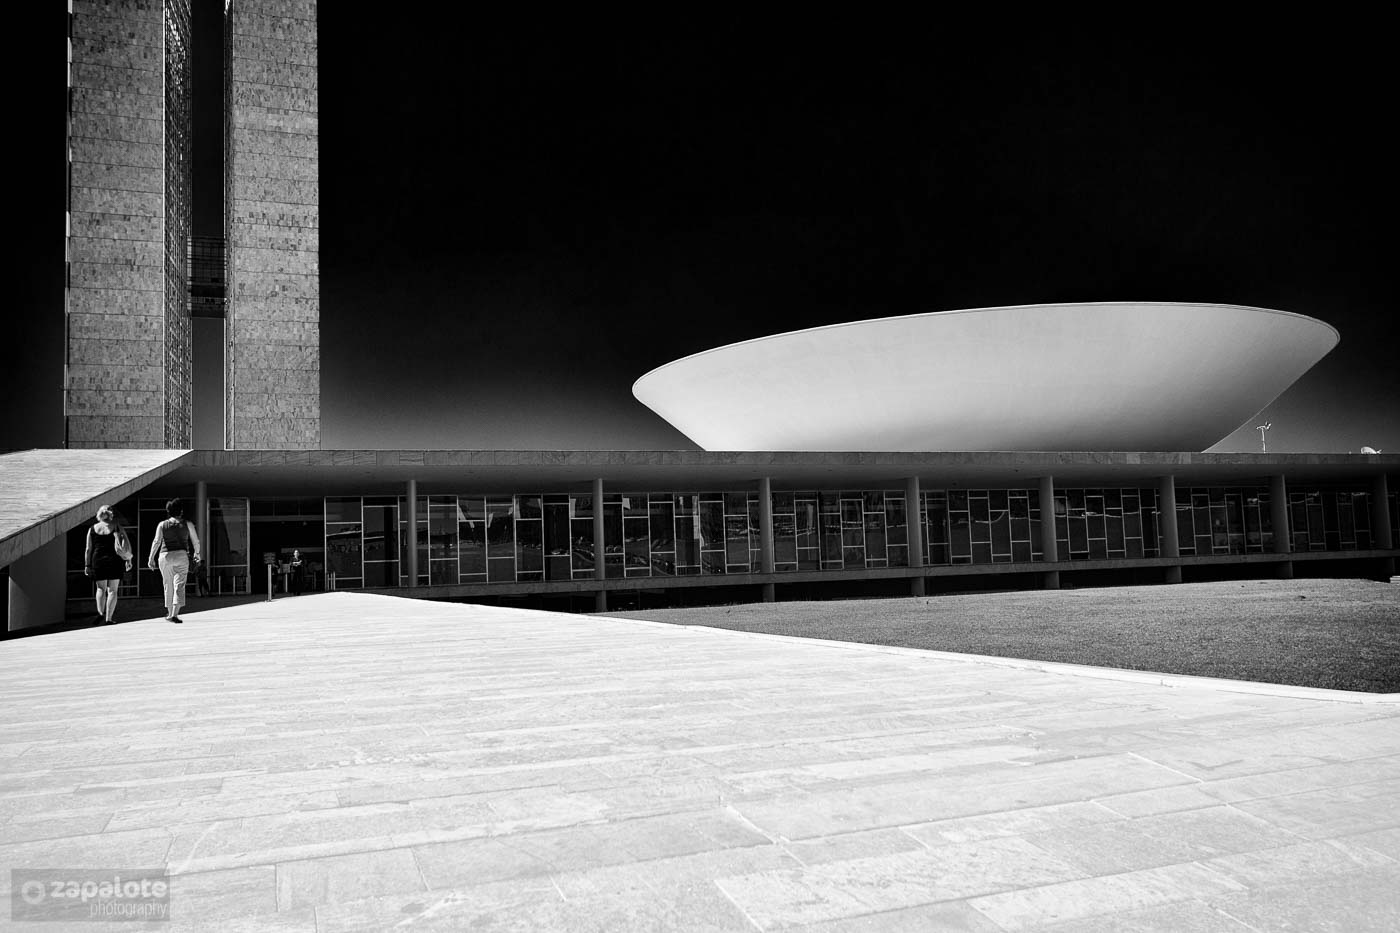 Zapalote Photography Iconic Architecture